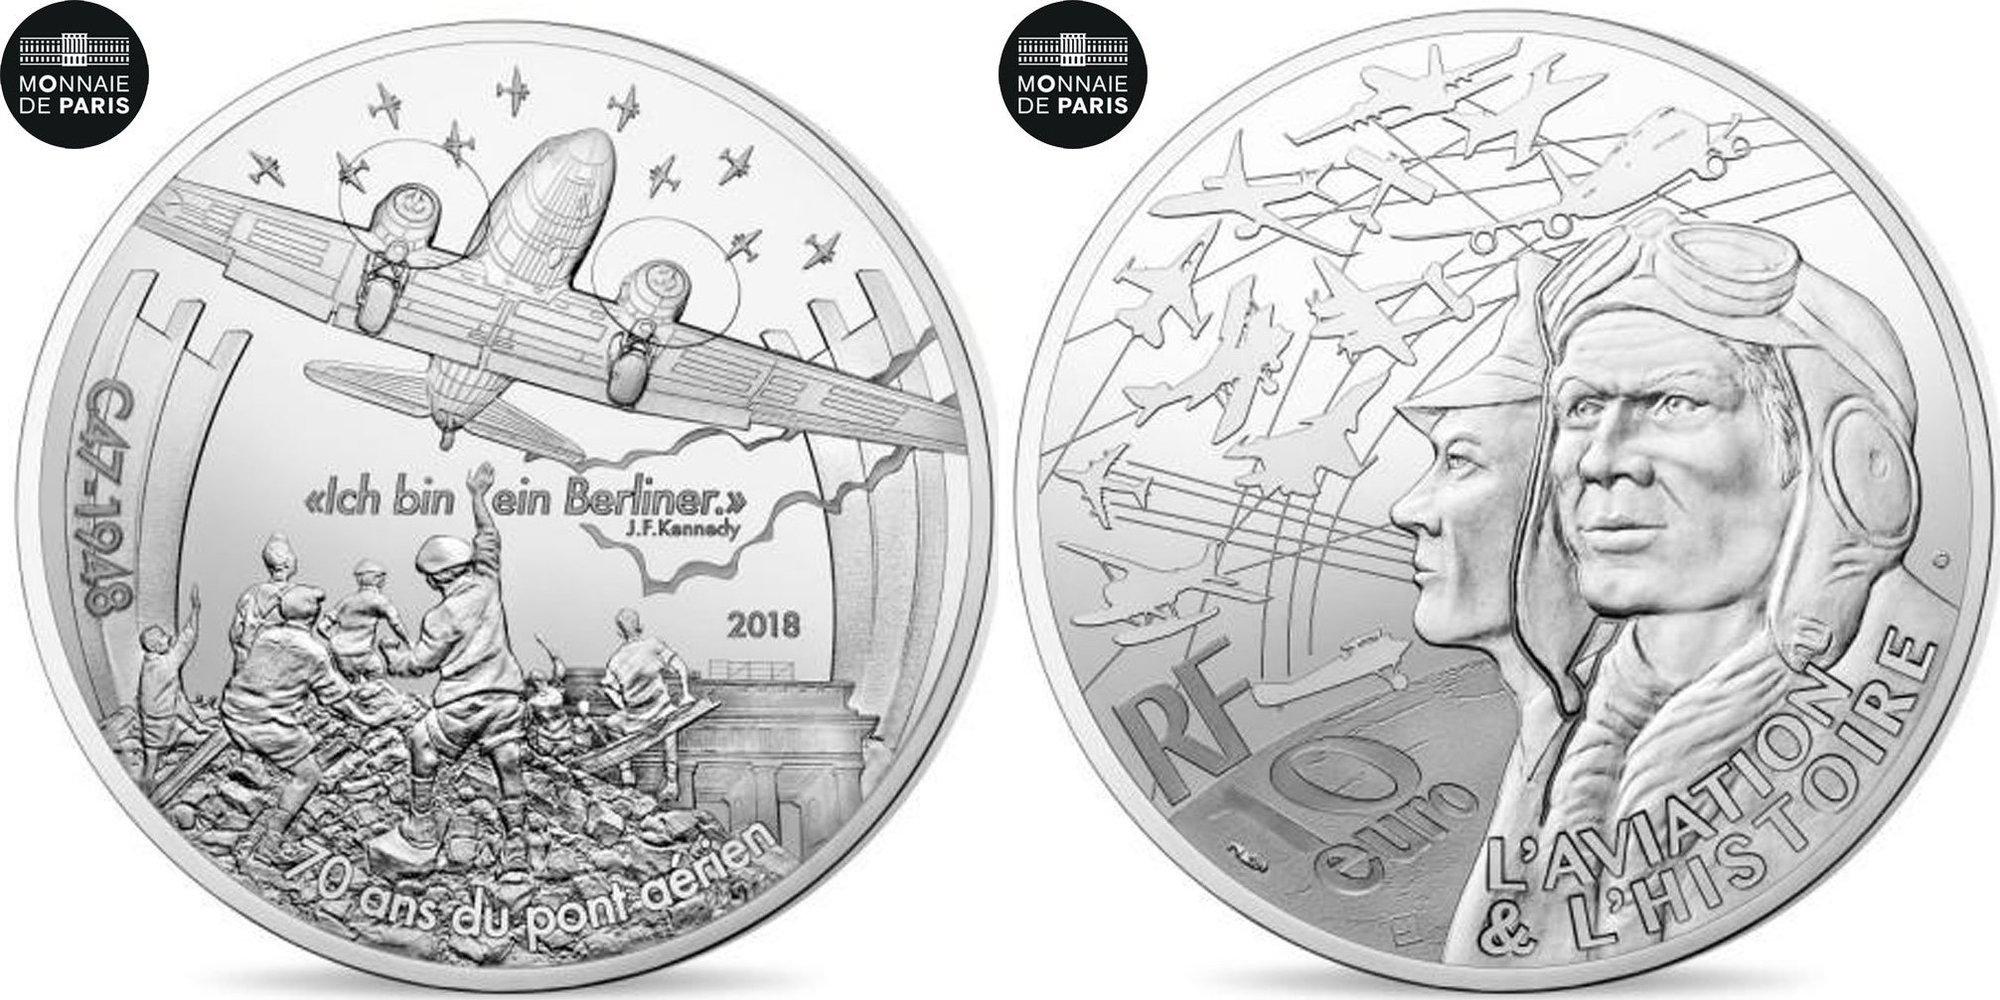 10 евро 2018 год  Самолет Дакота C47. История французской авиации. Война. Франция. Серебро